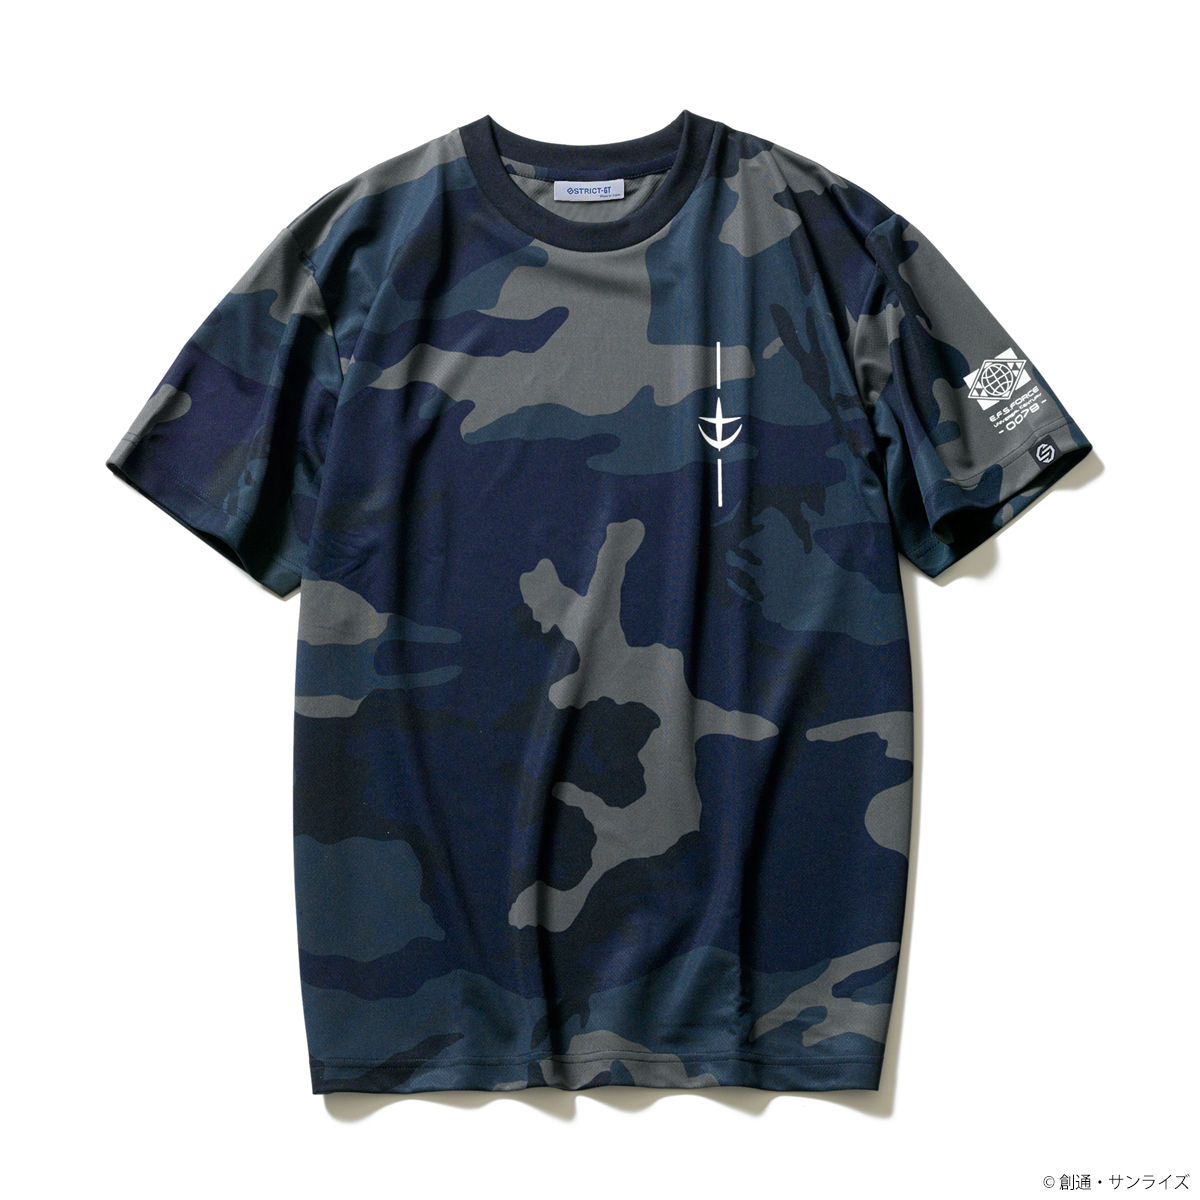 EFSF Camo Shirt—Mobile Suit Gundam/STRICT-G Collaboration